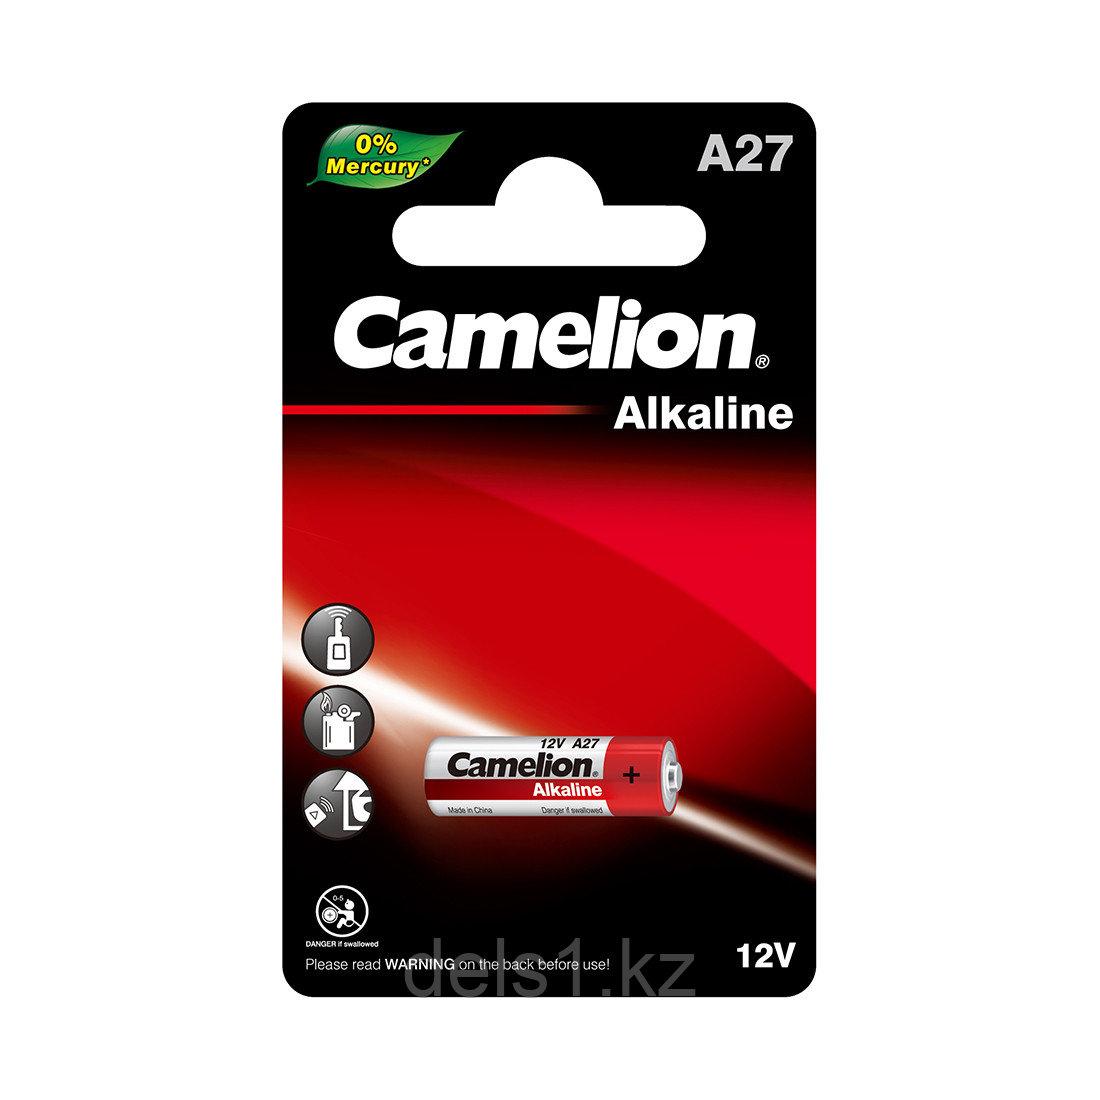 Батарейка, CAMELION, A27-BP1, 12V, 16 mAh, 1 шт.